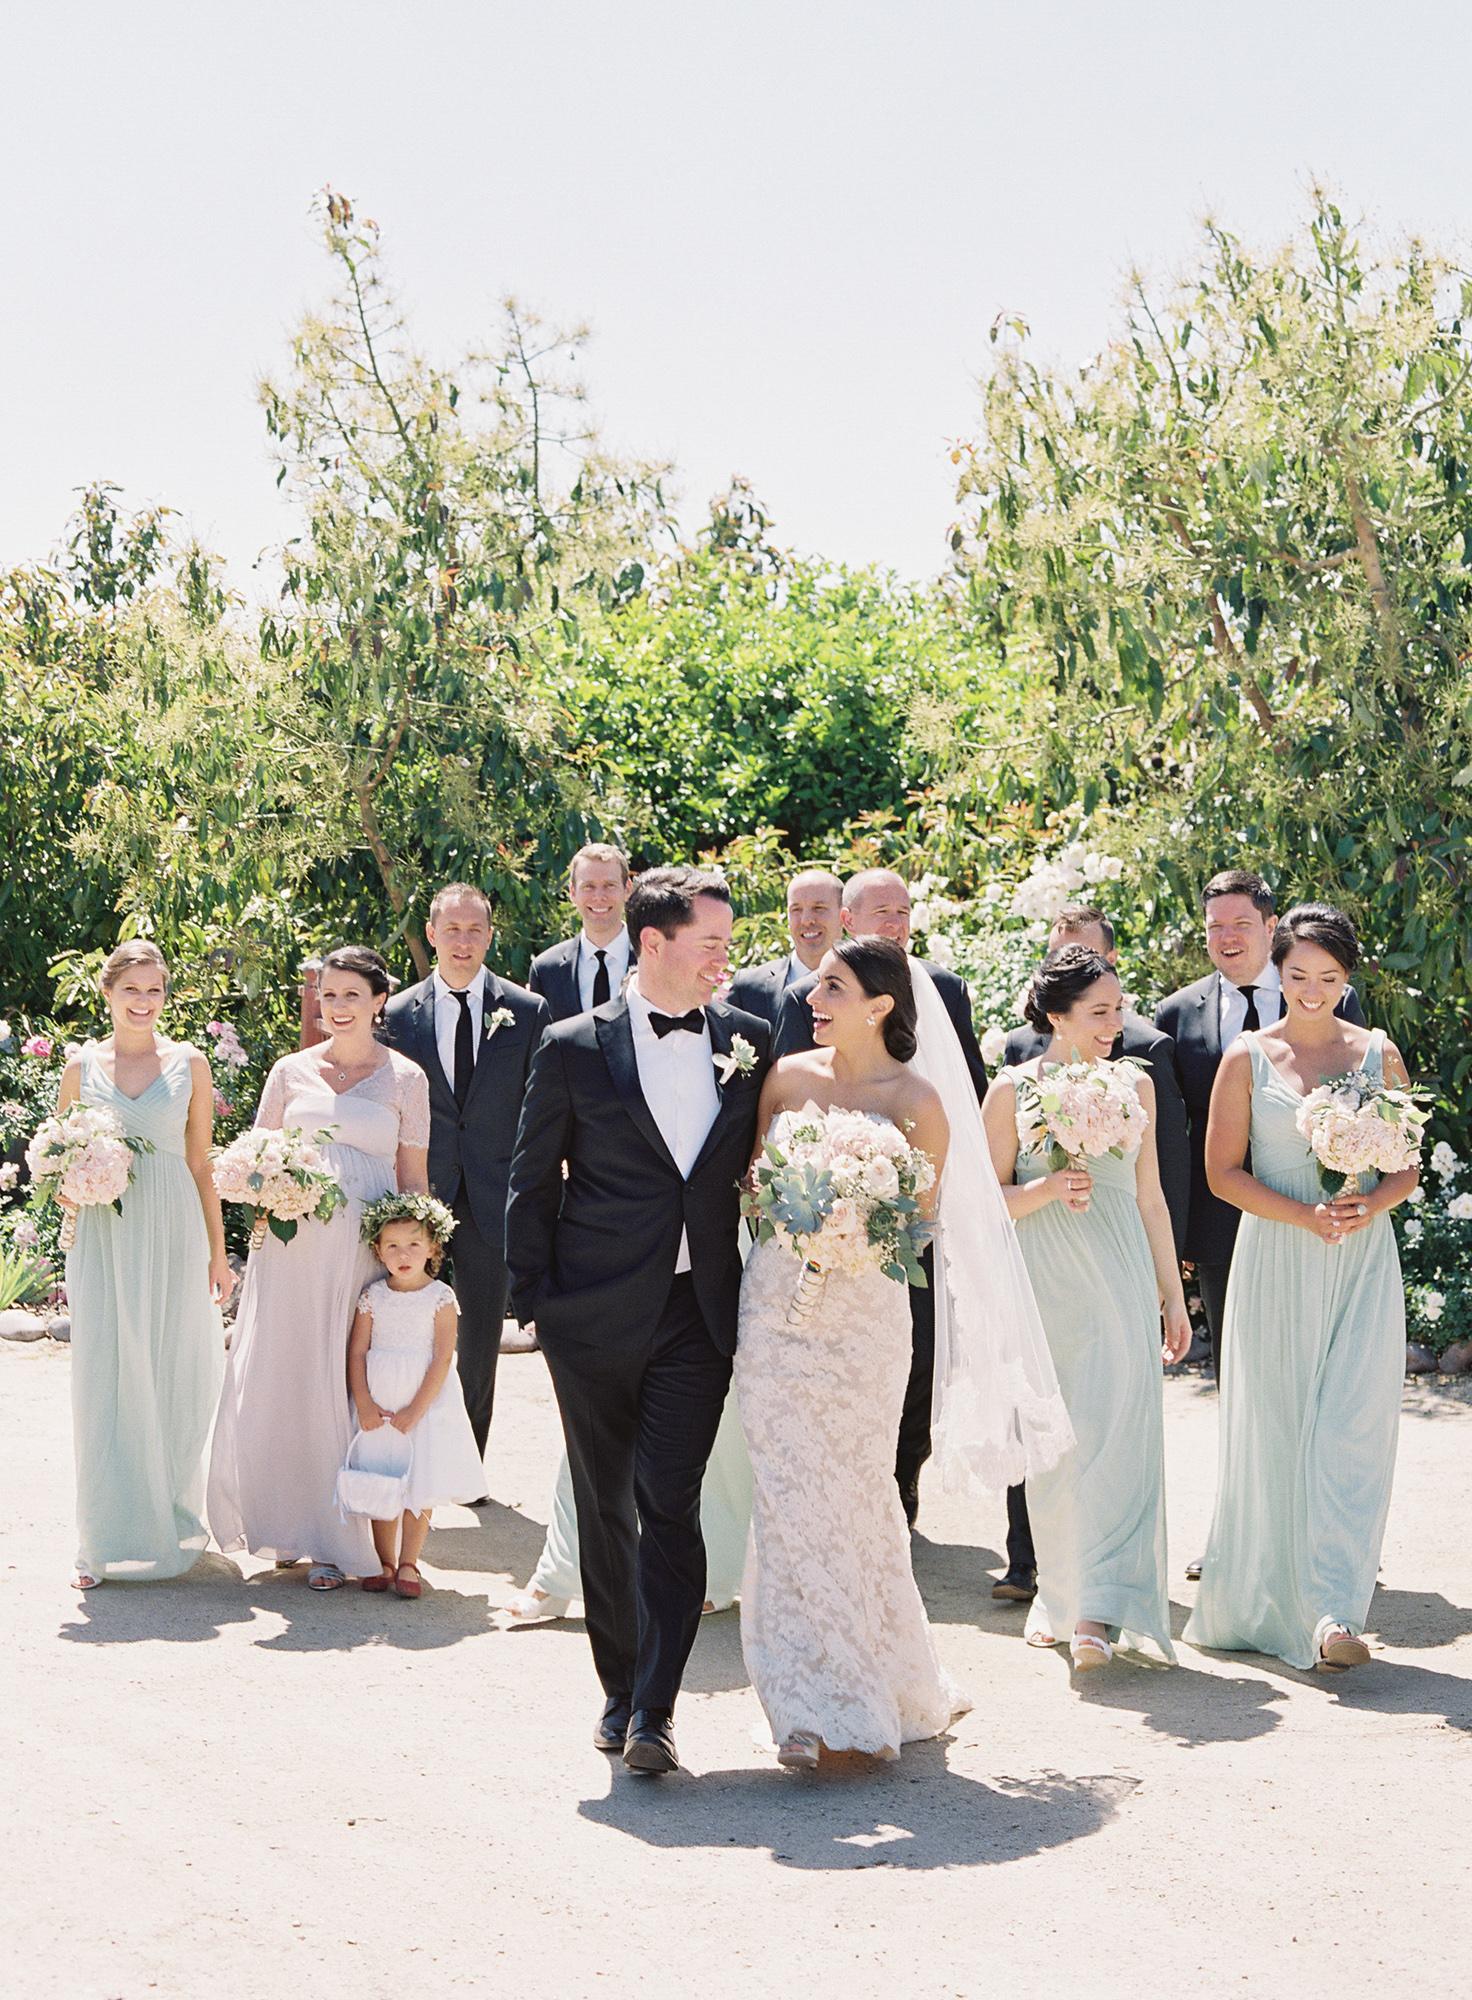 Gerry-Ranch-Wedding-Photography-Kristina-Adams-12.jpg